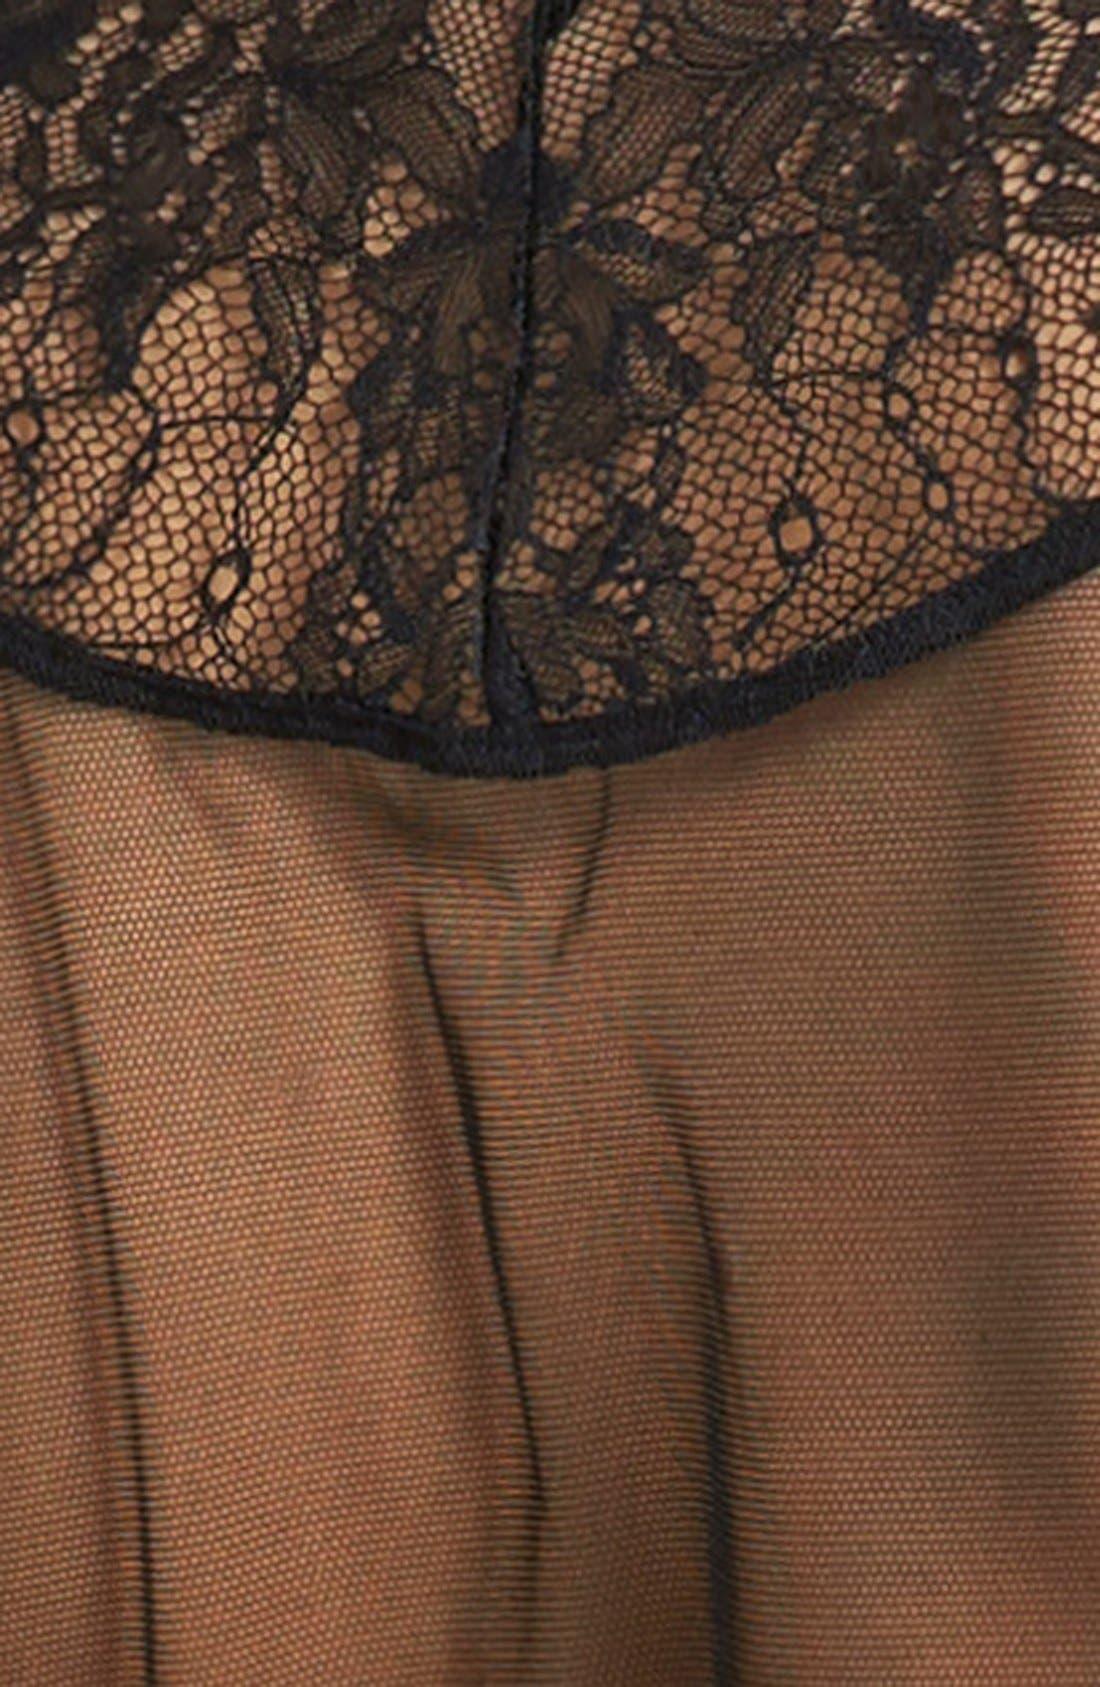 AGENT PROVOCATEUR,                             L'Agent by Agent Provocateur 'Idalia' Short Robe,                             Alternate thumbnail 3, color,                             001